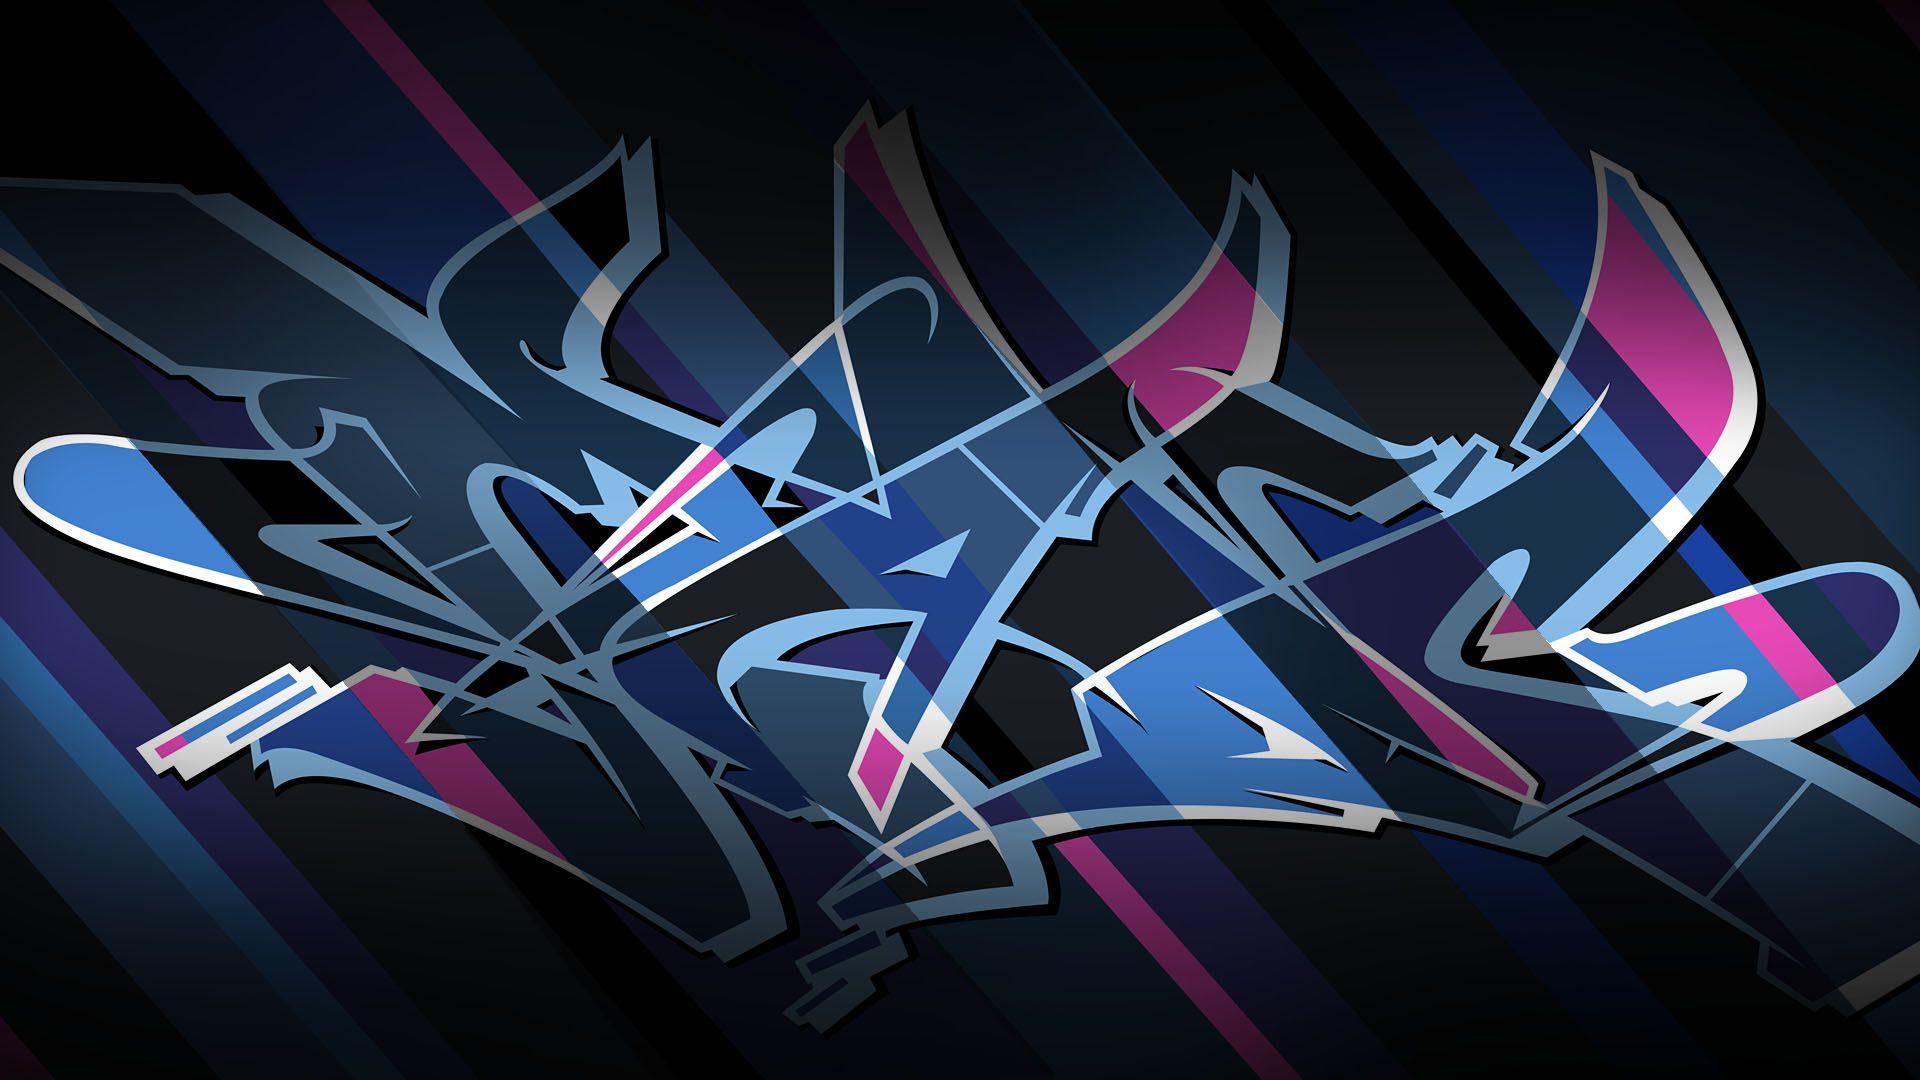 Wallpapers Kid Ink Bombing Science Graffiti Blog Madc Design